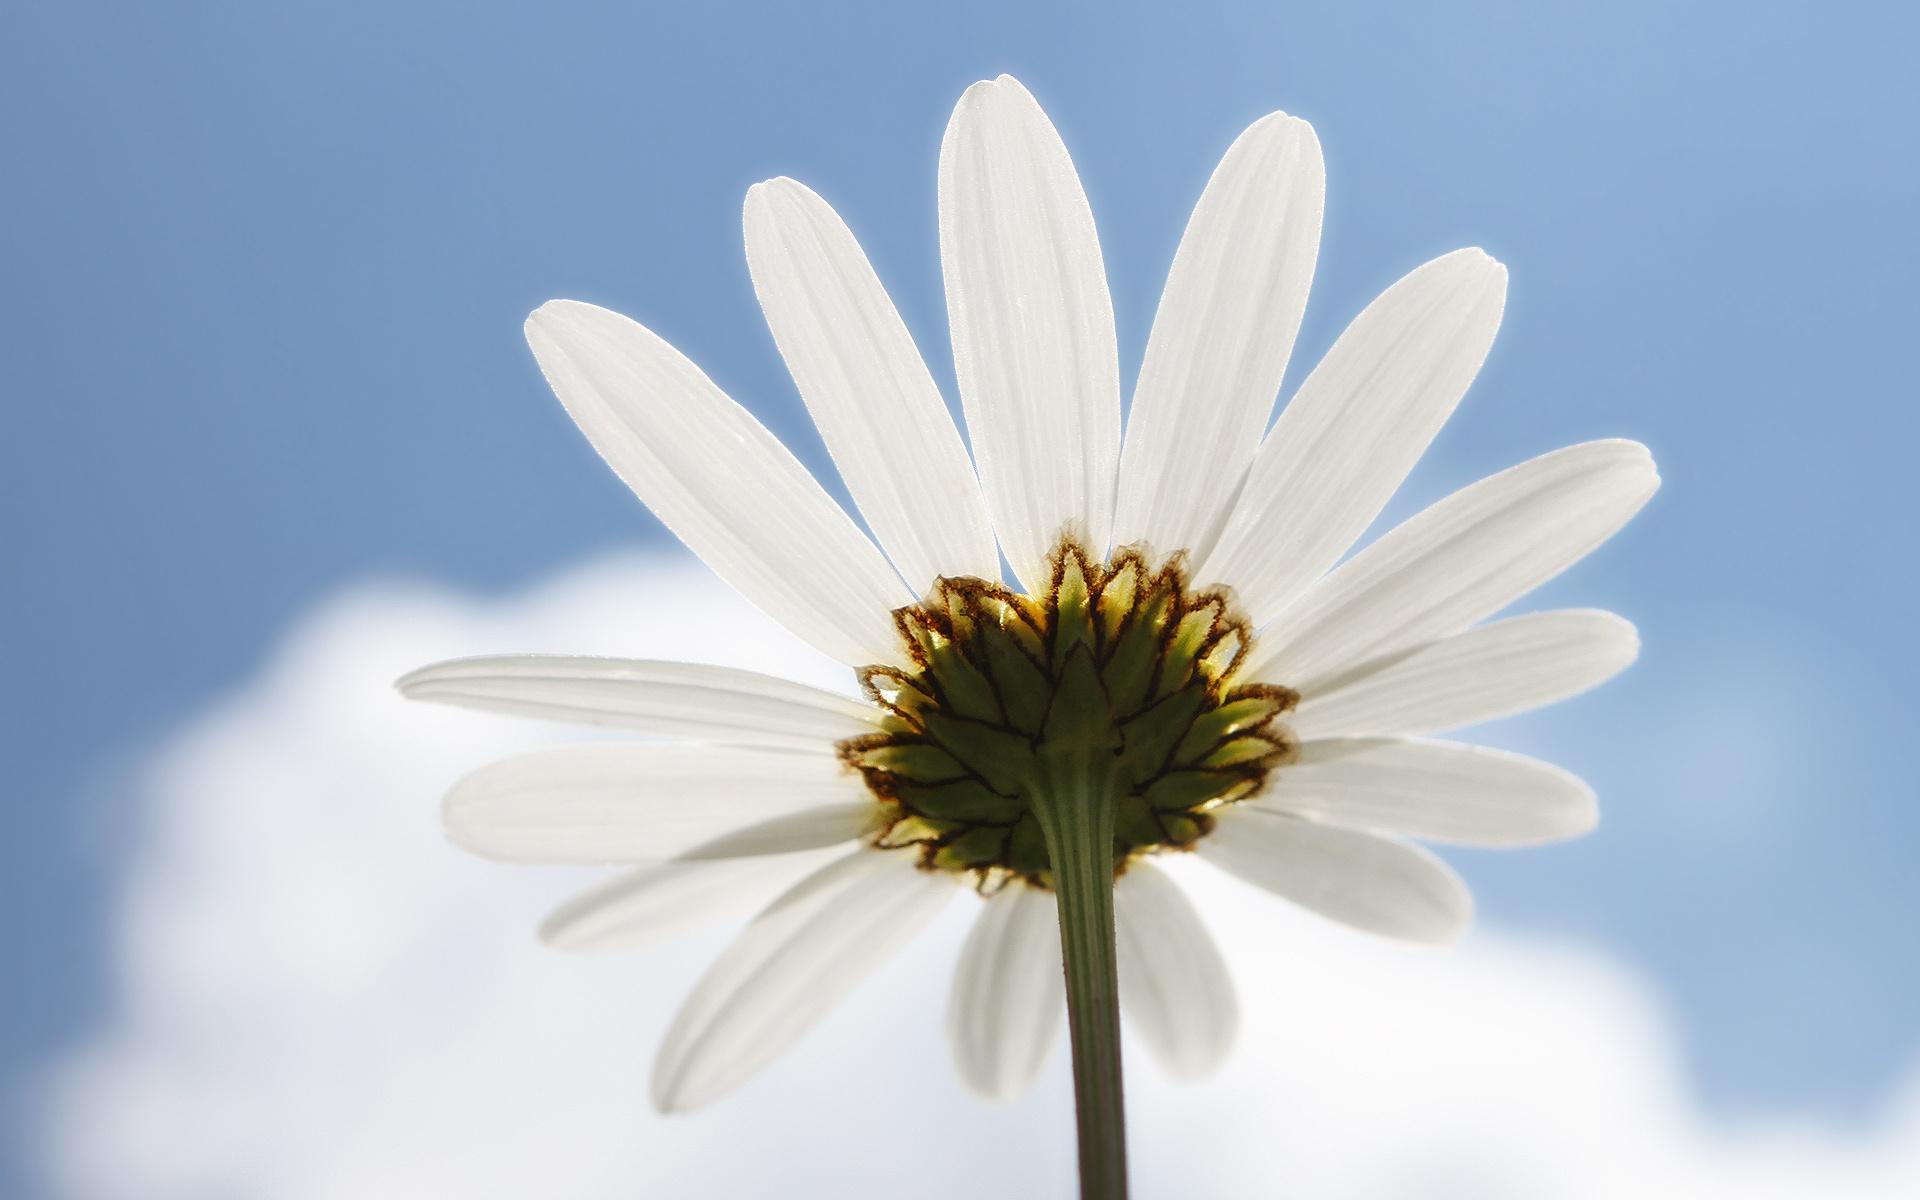 hinh anh hoa cuc dep 12